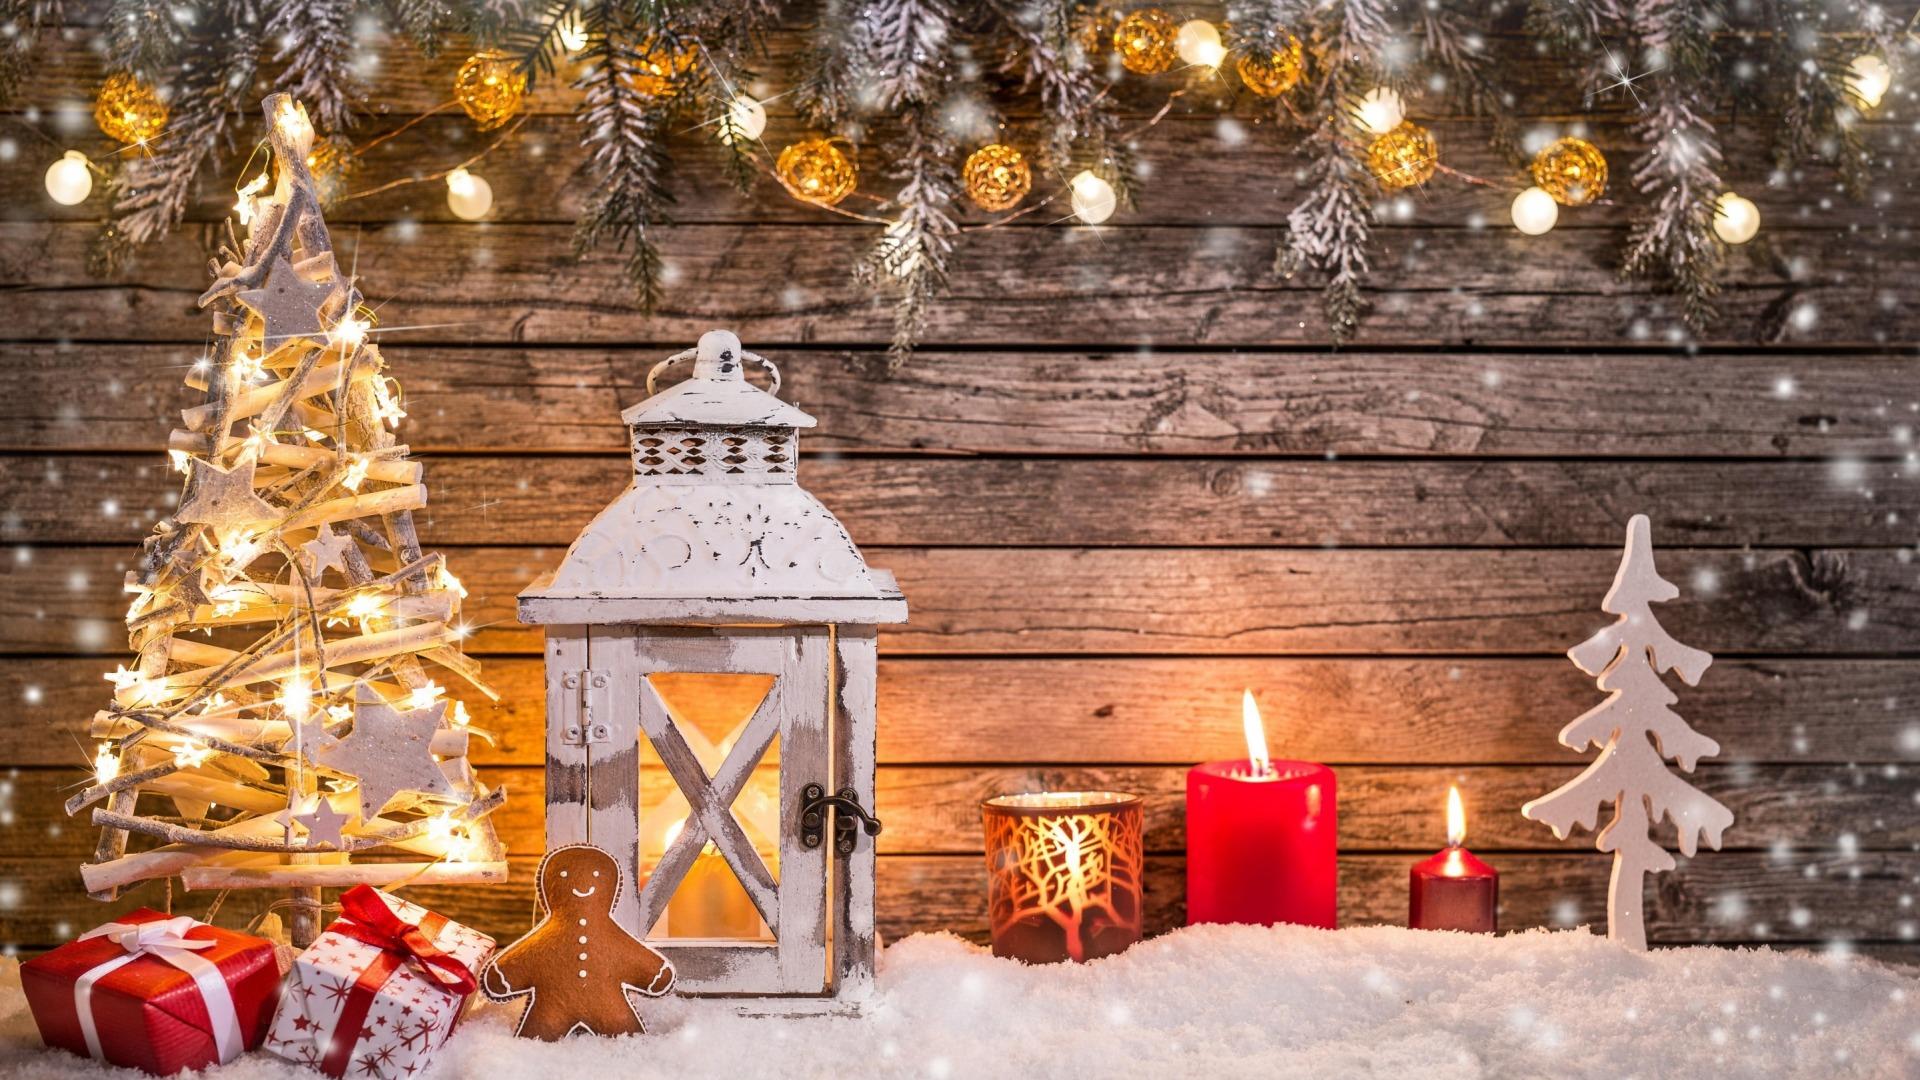 Free Download Beautiful Desktop Hd Christmas Wallpapers